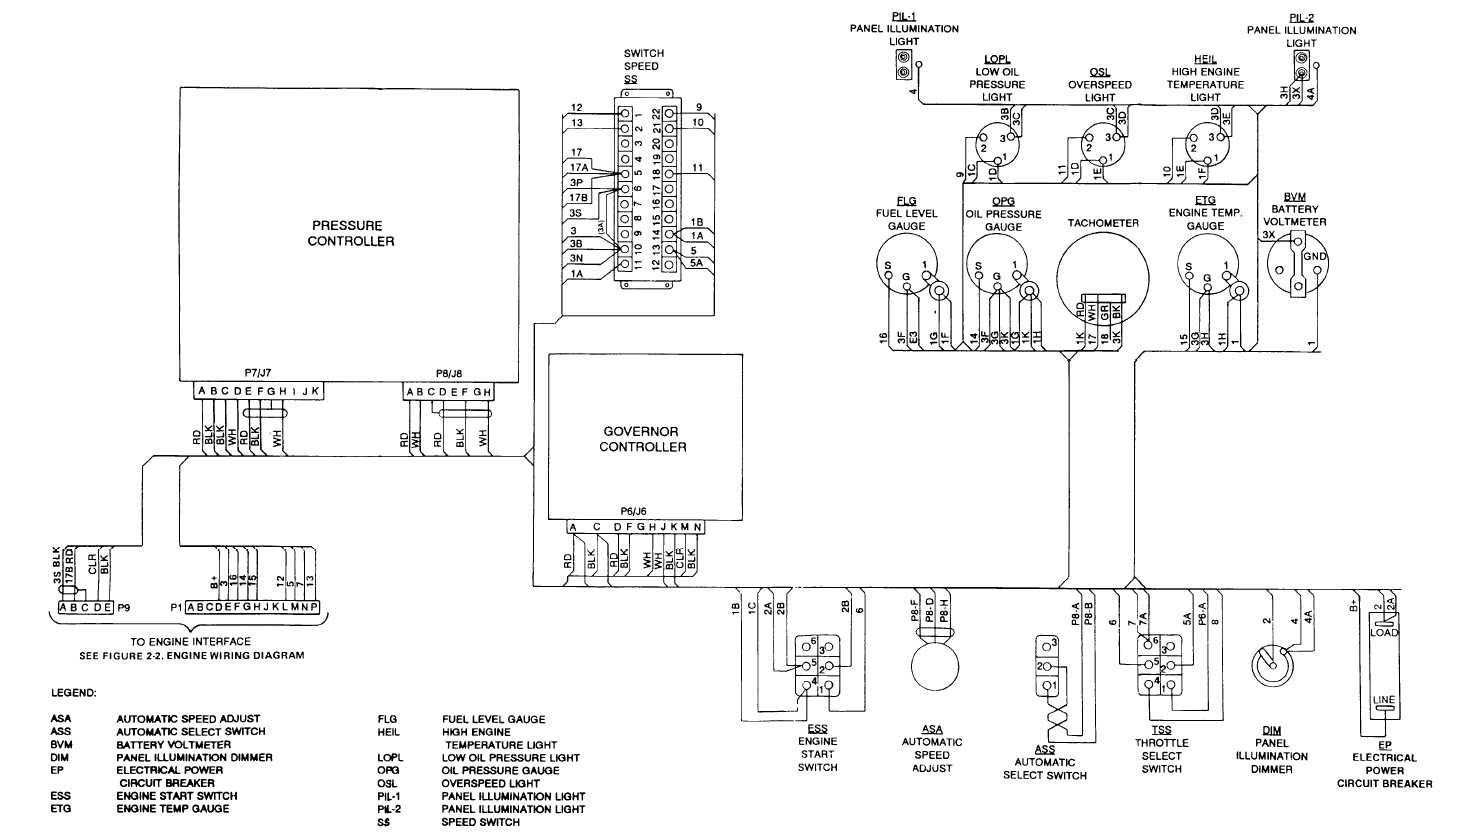 Figure 2-1. Control Panel Wiring Diagram (Sheet 1 Of 4